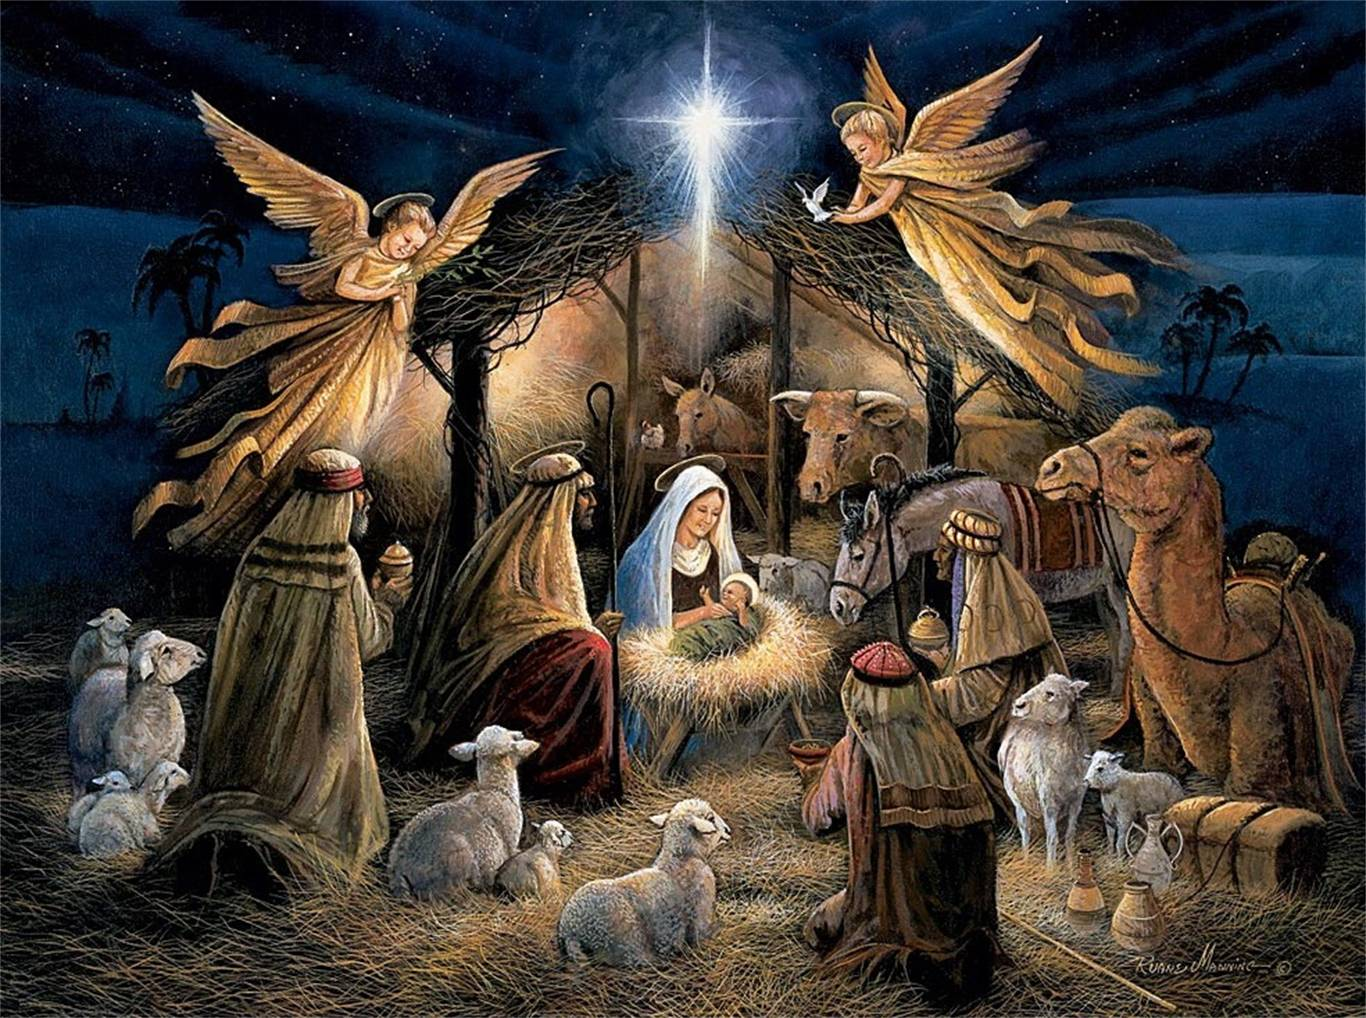 birth-of-christ-image_full